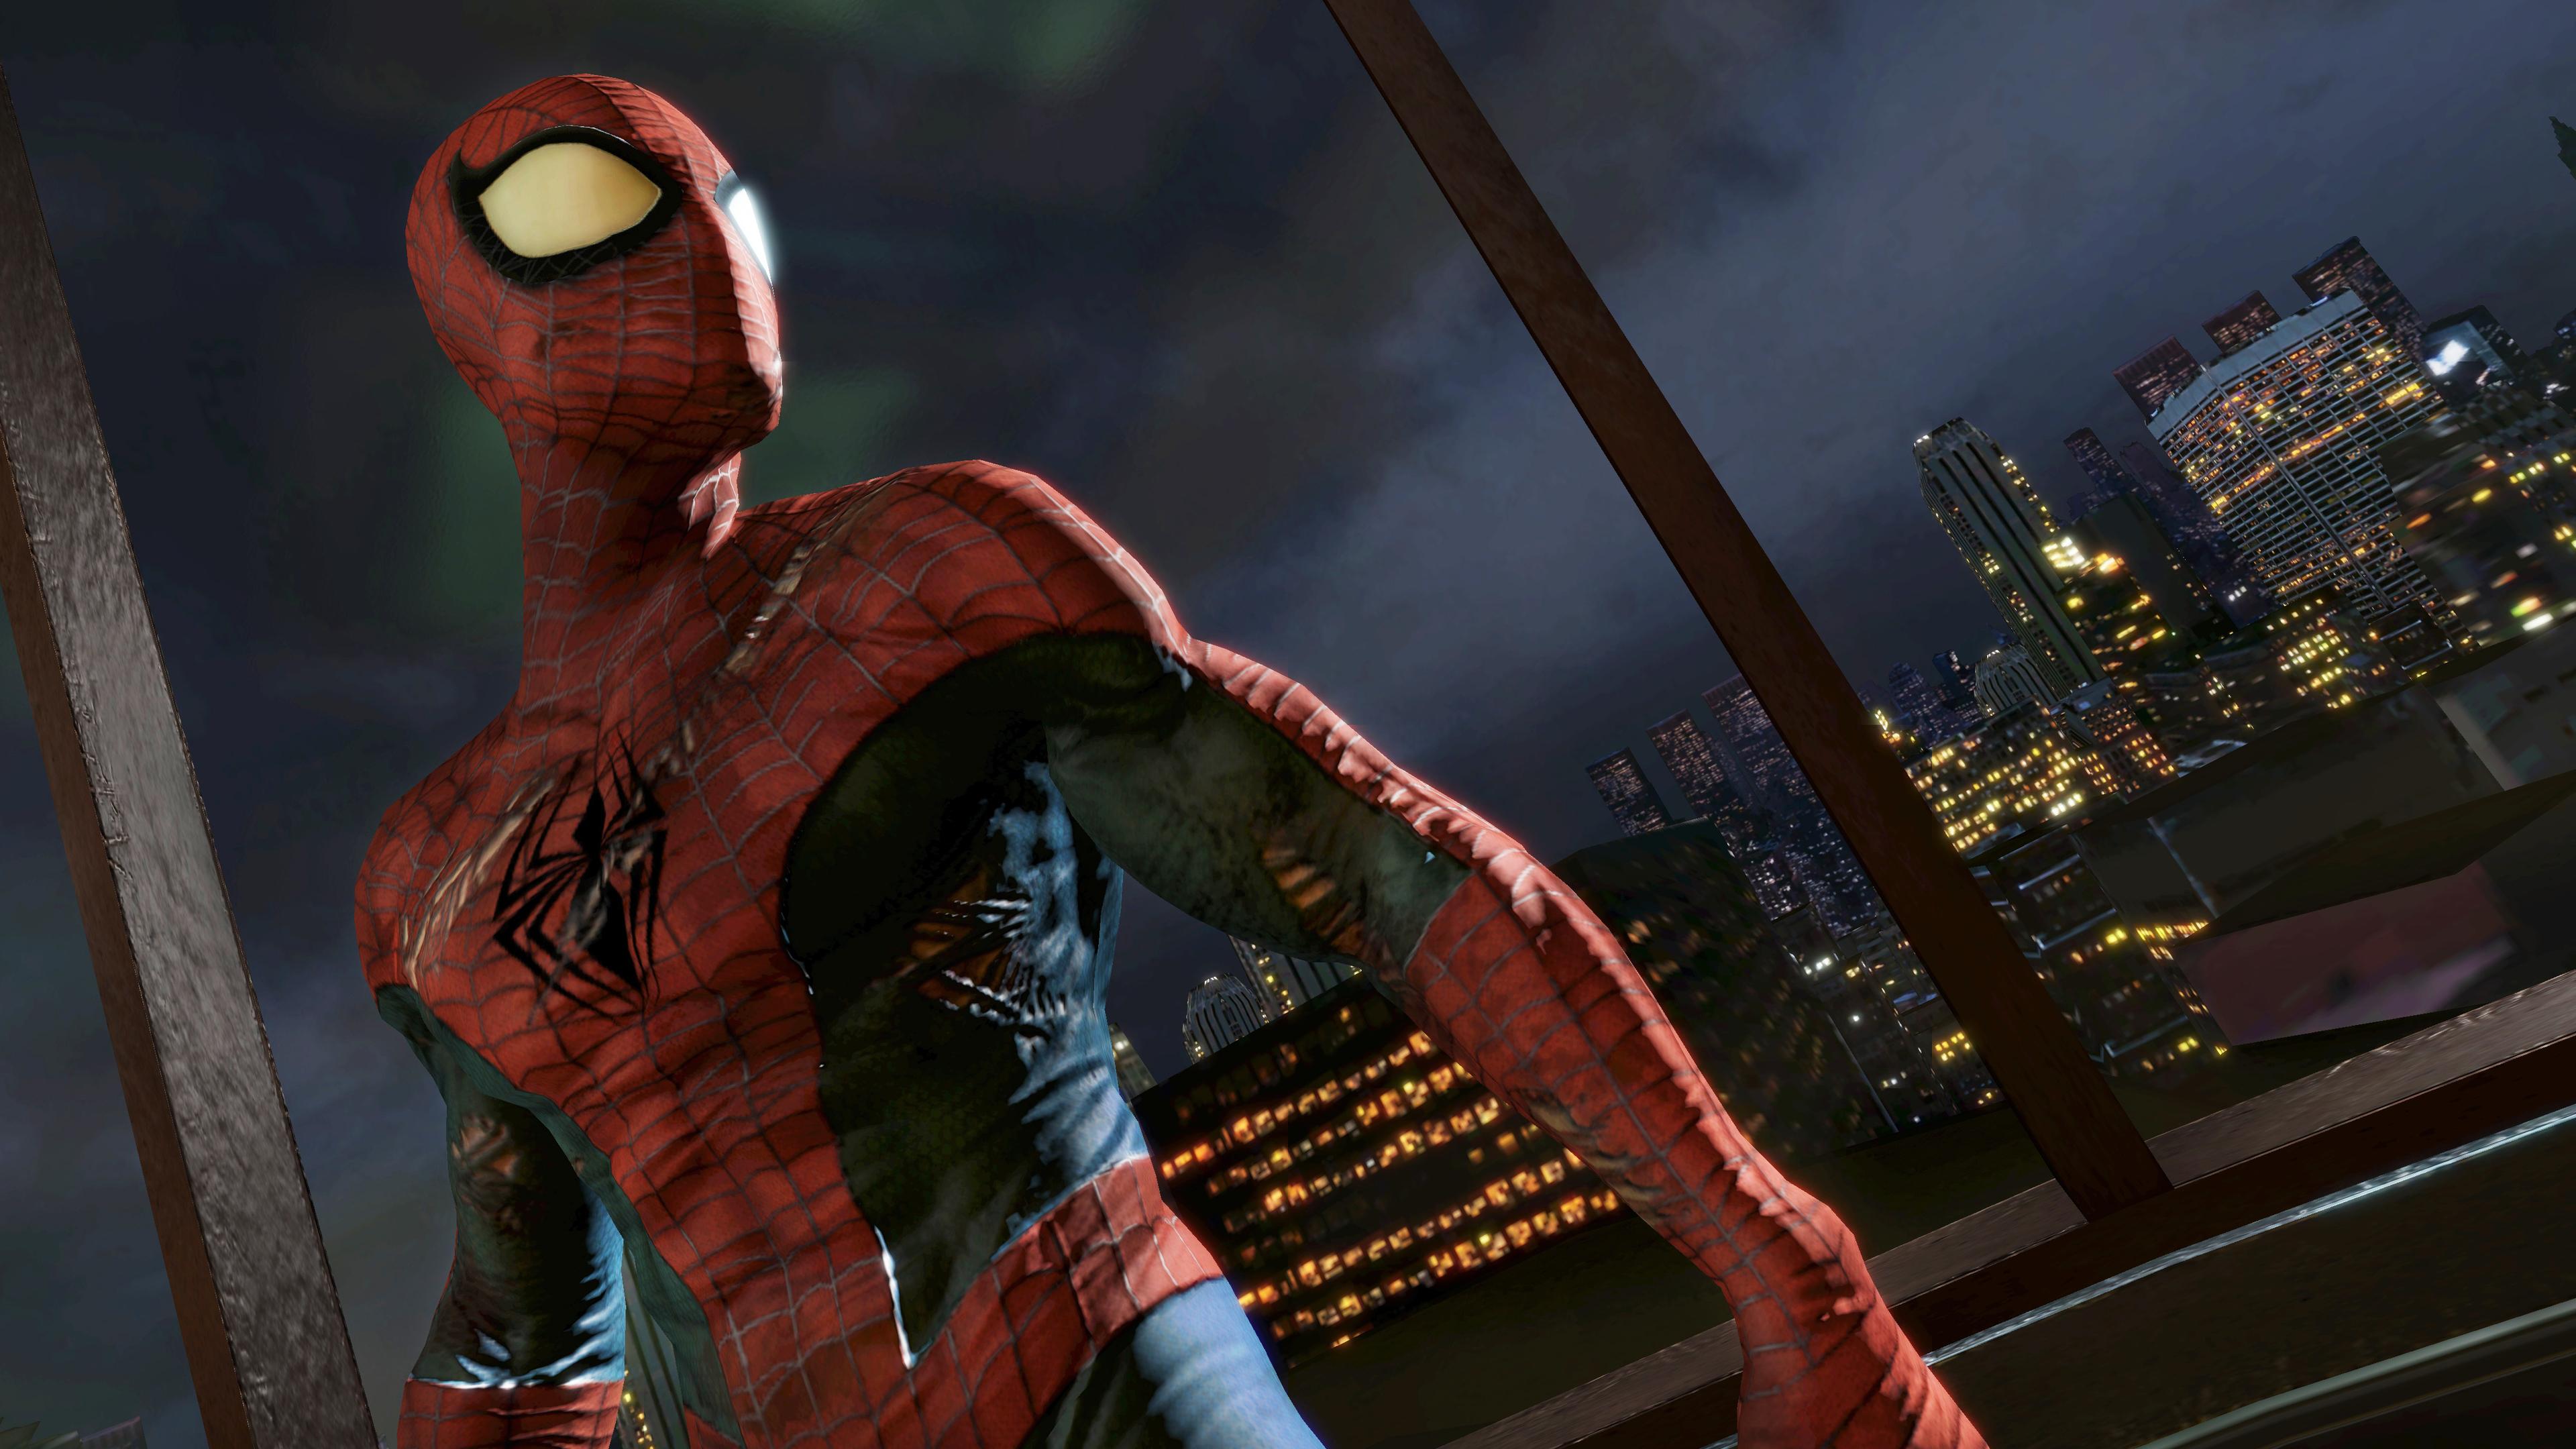 spiderman injured 4k 1545588608 - Spiderman Injured 4k - superheroes wallpapers, spiderman wallpapers, hd-wallpapers, 5k wallpapers, 4k-wallpapers